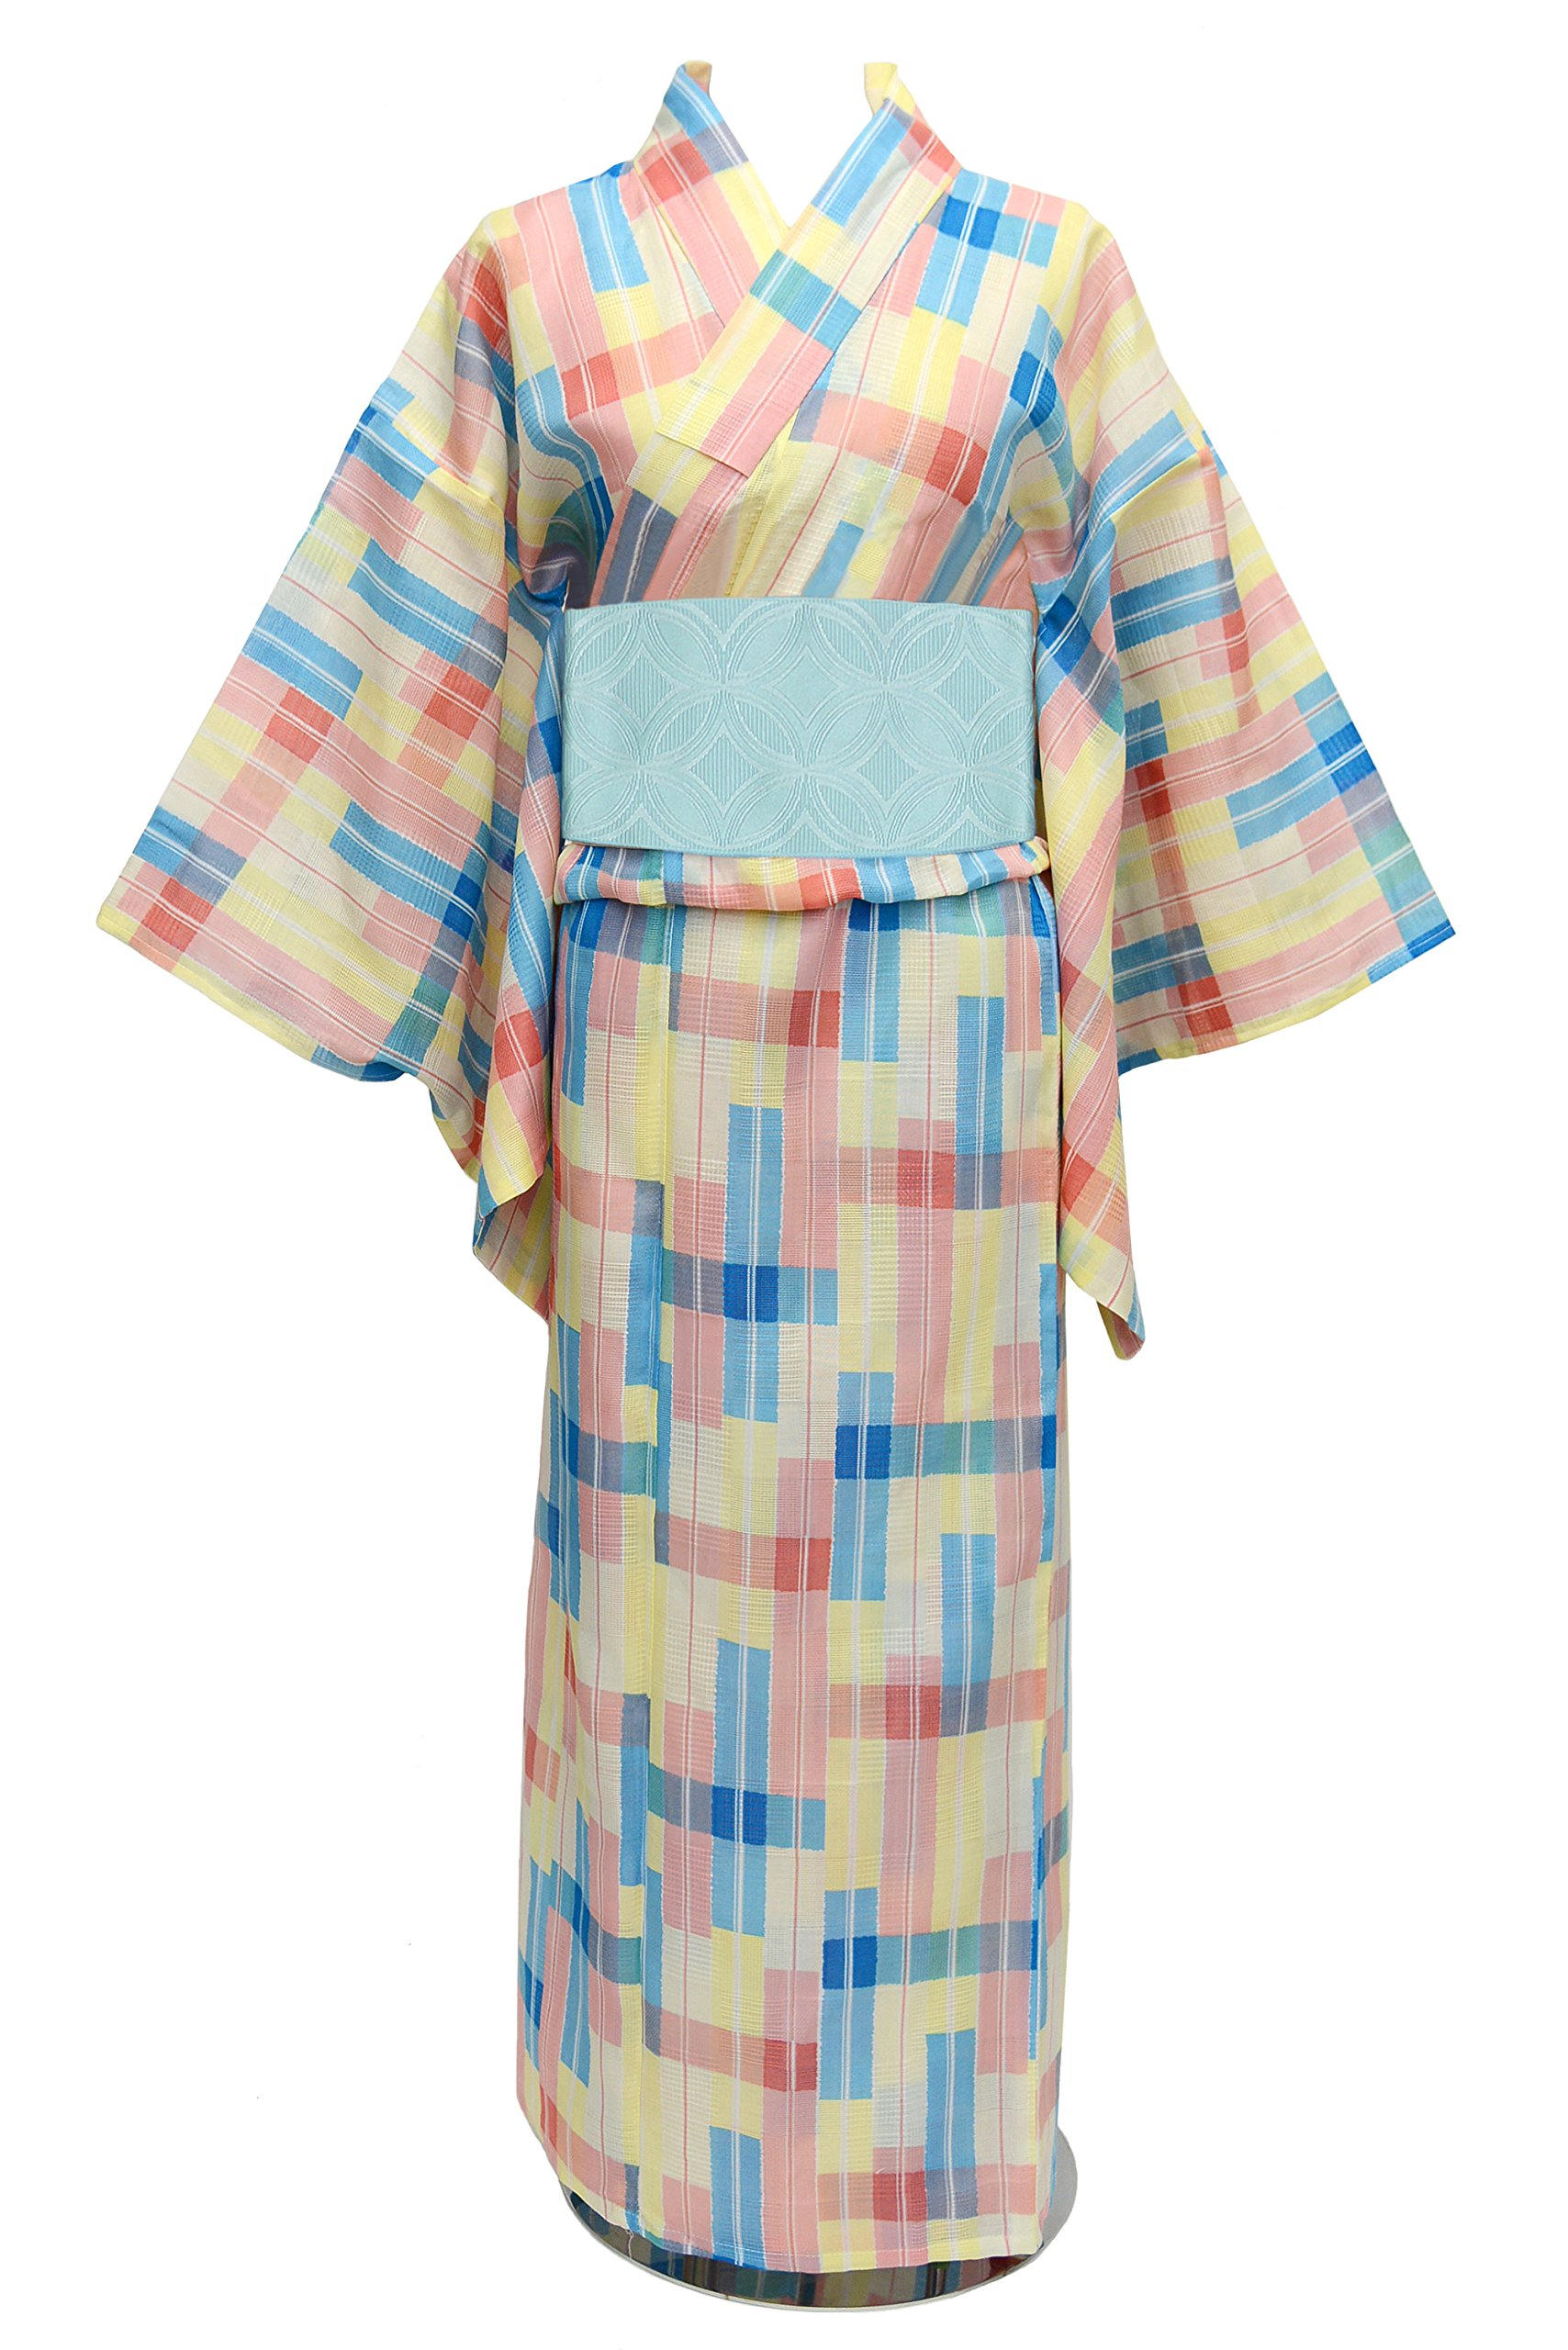 [Haloween Sale 50% OFF] KimonoMode24 Women's Japanese Yukata Blue Obi Set/Change Weaving Free Size Yellow